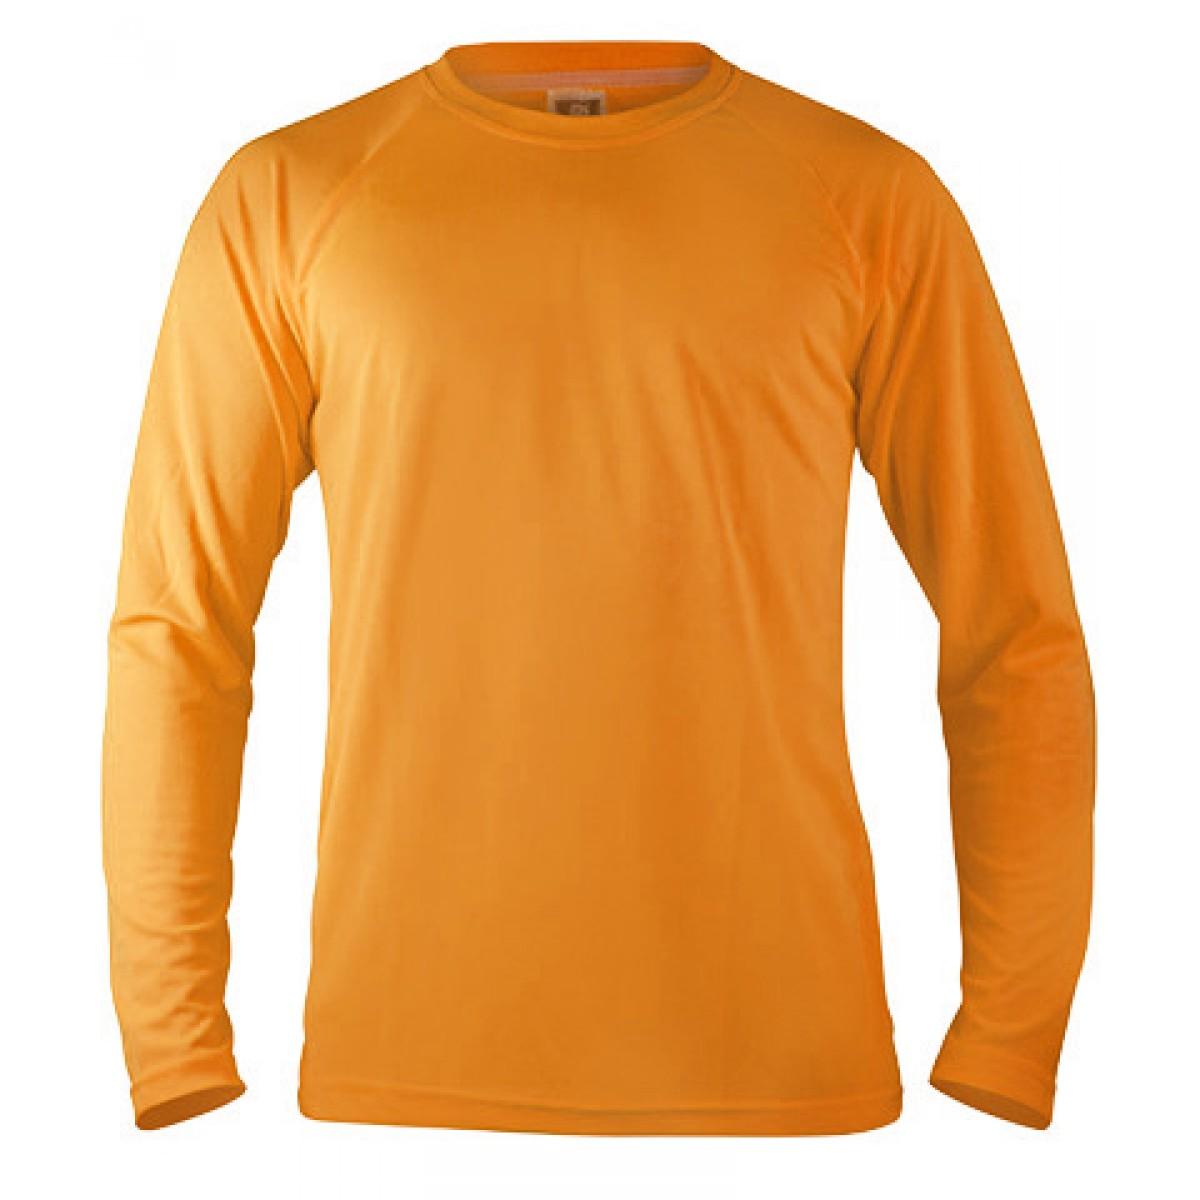 Long Sleeve Mesh Performance T-shirt-Neon Orange -L